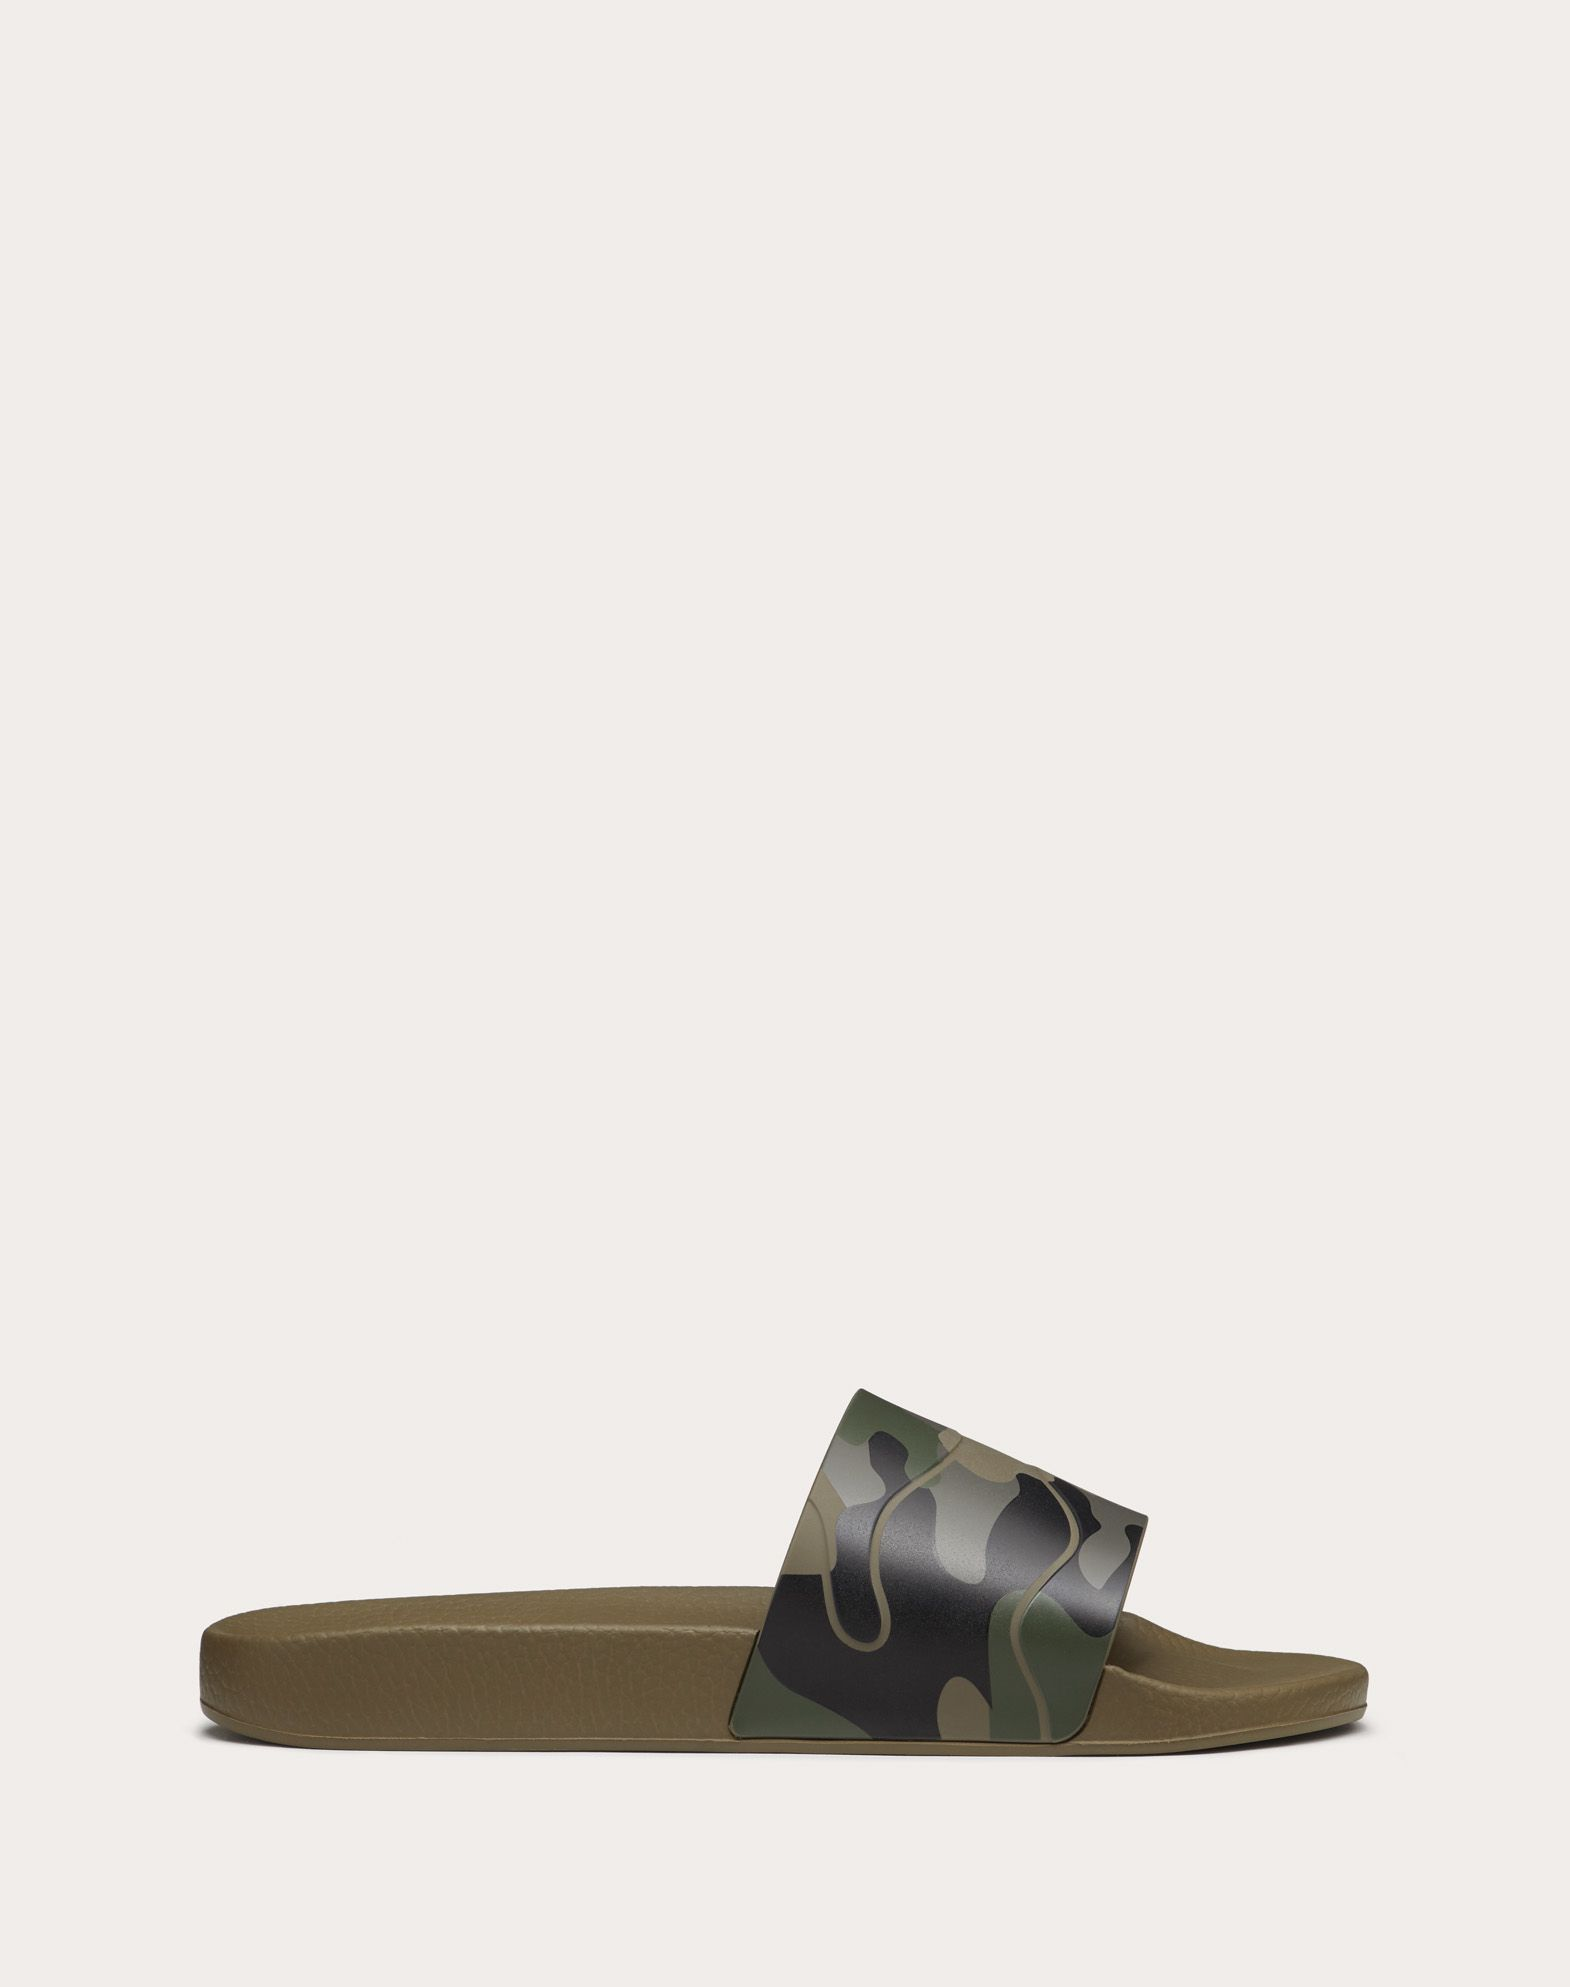 VALENTINO Camouflage Rubber sole Round toeline 44753781vk